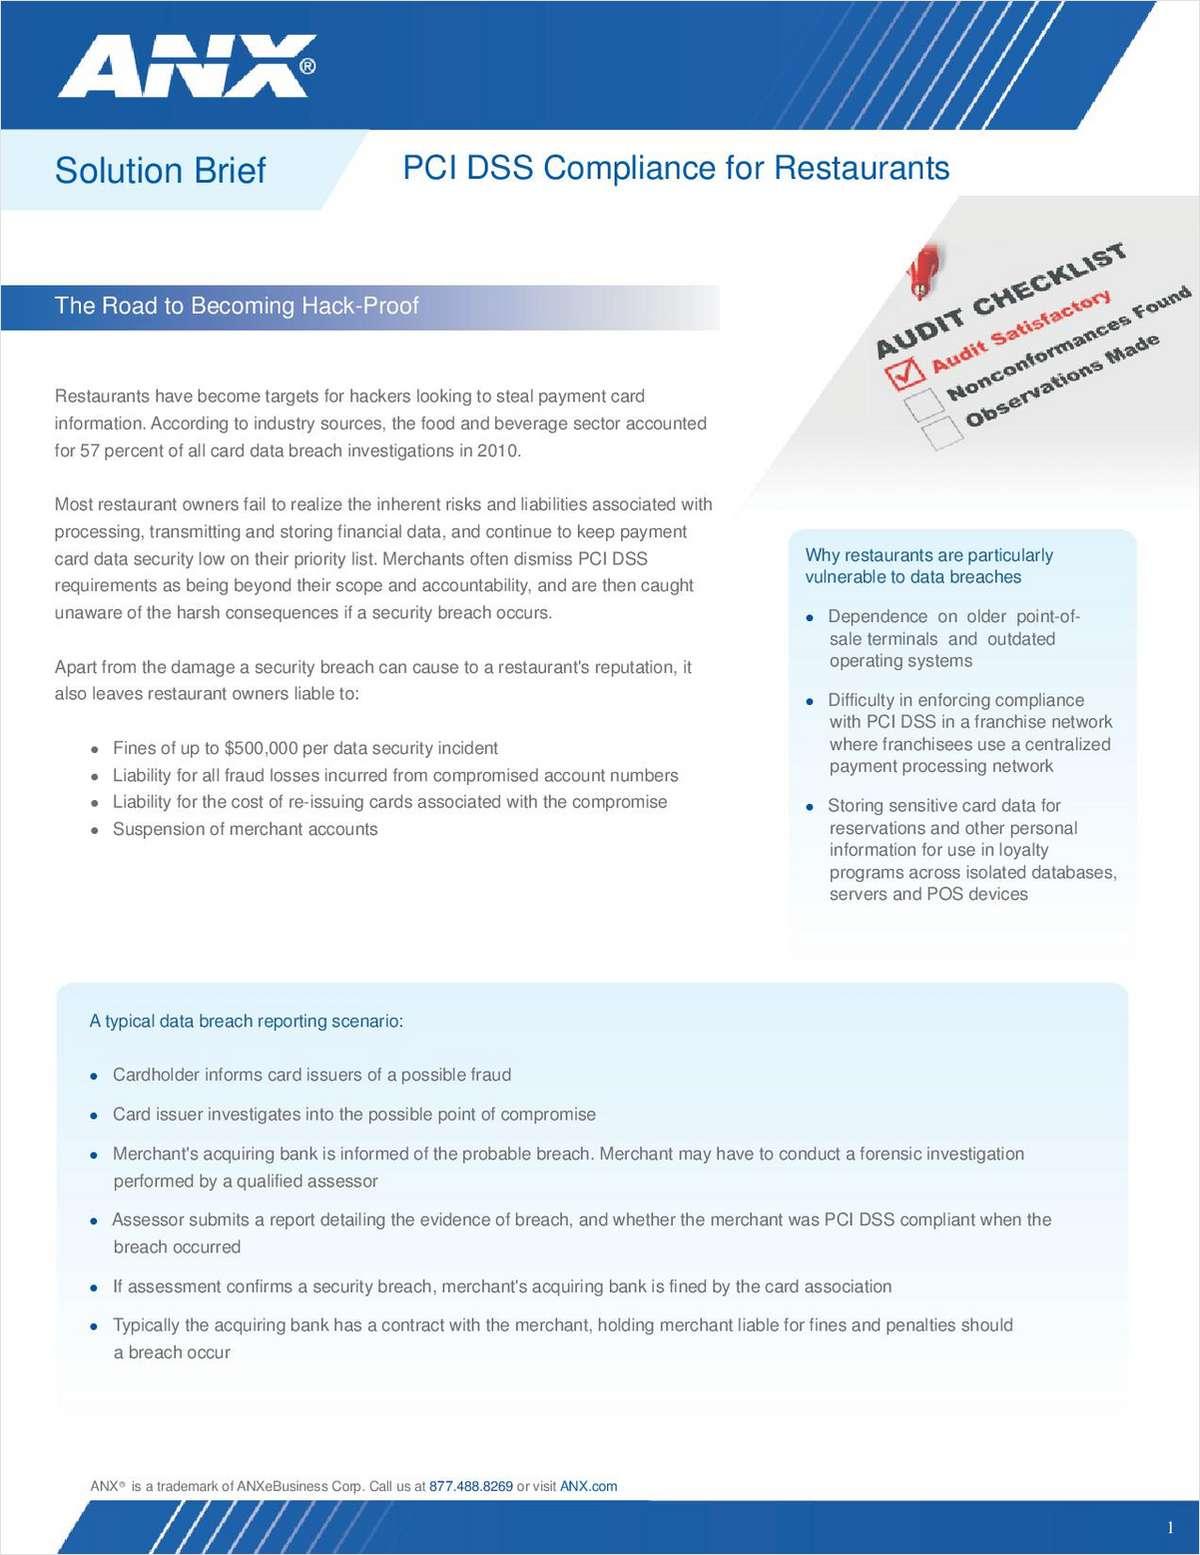 PCI DSS Compliance for Restaurants